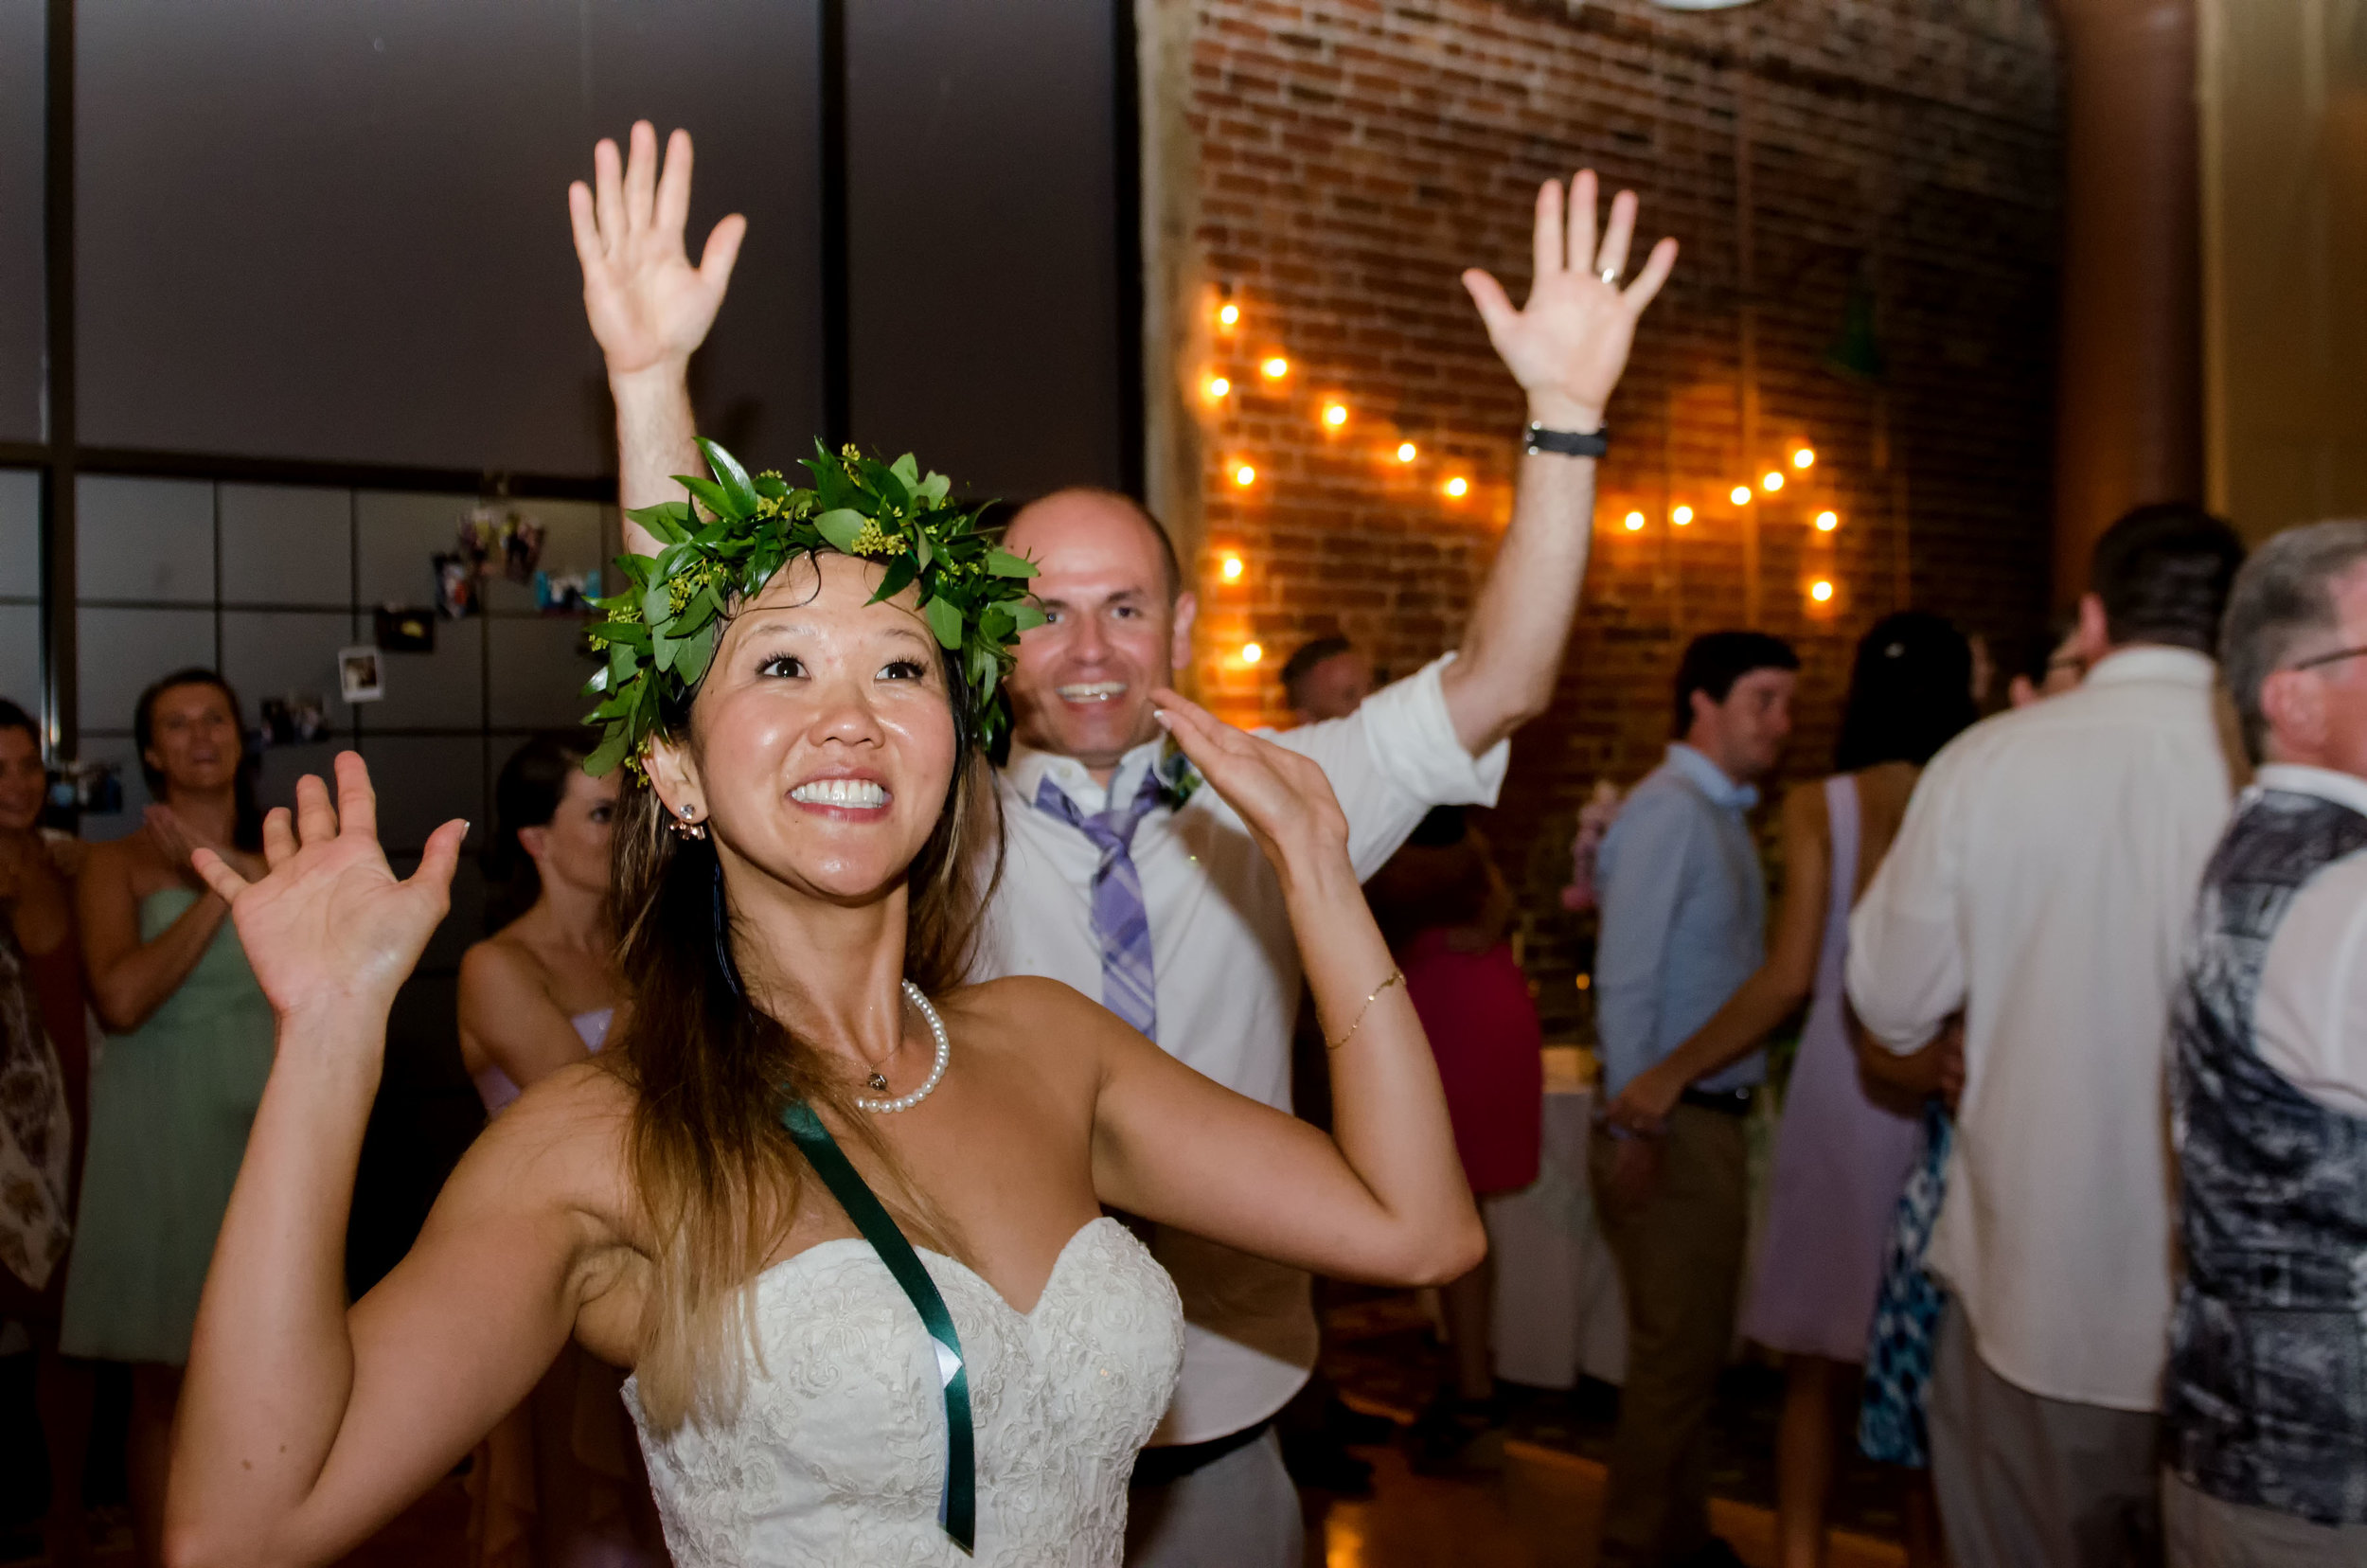 North_Carolina_Wedding_Photographer_Tiffany_Abruzzo_Reception_145.jpg